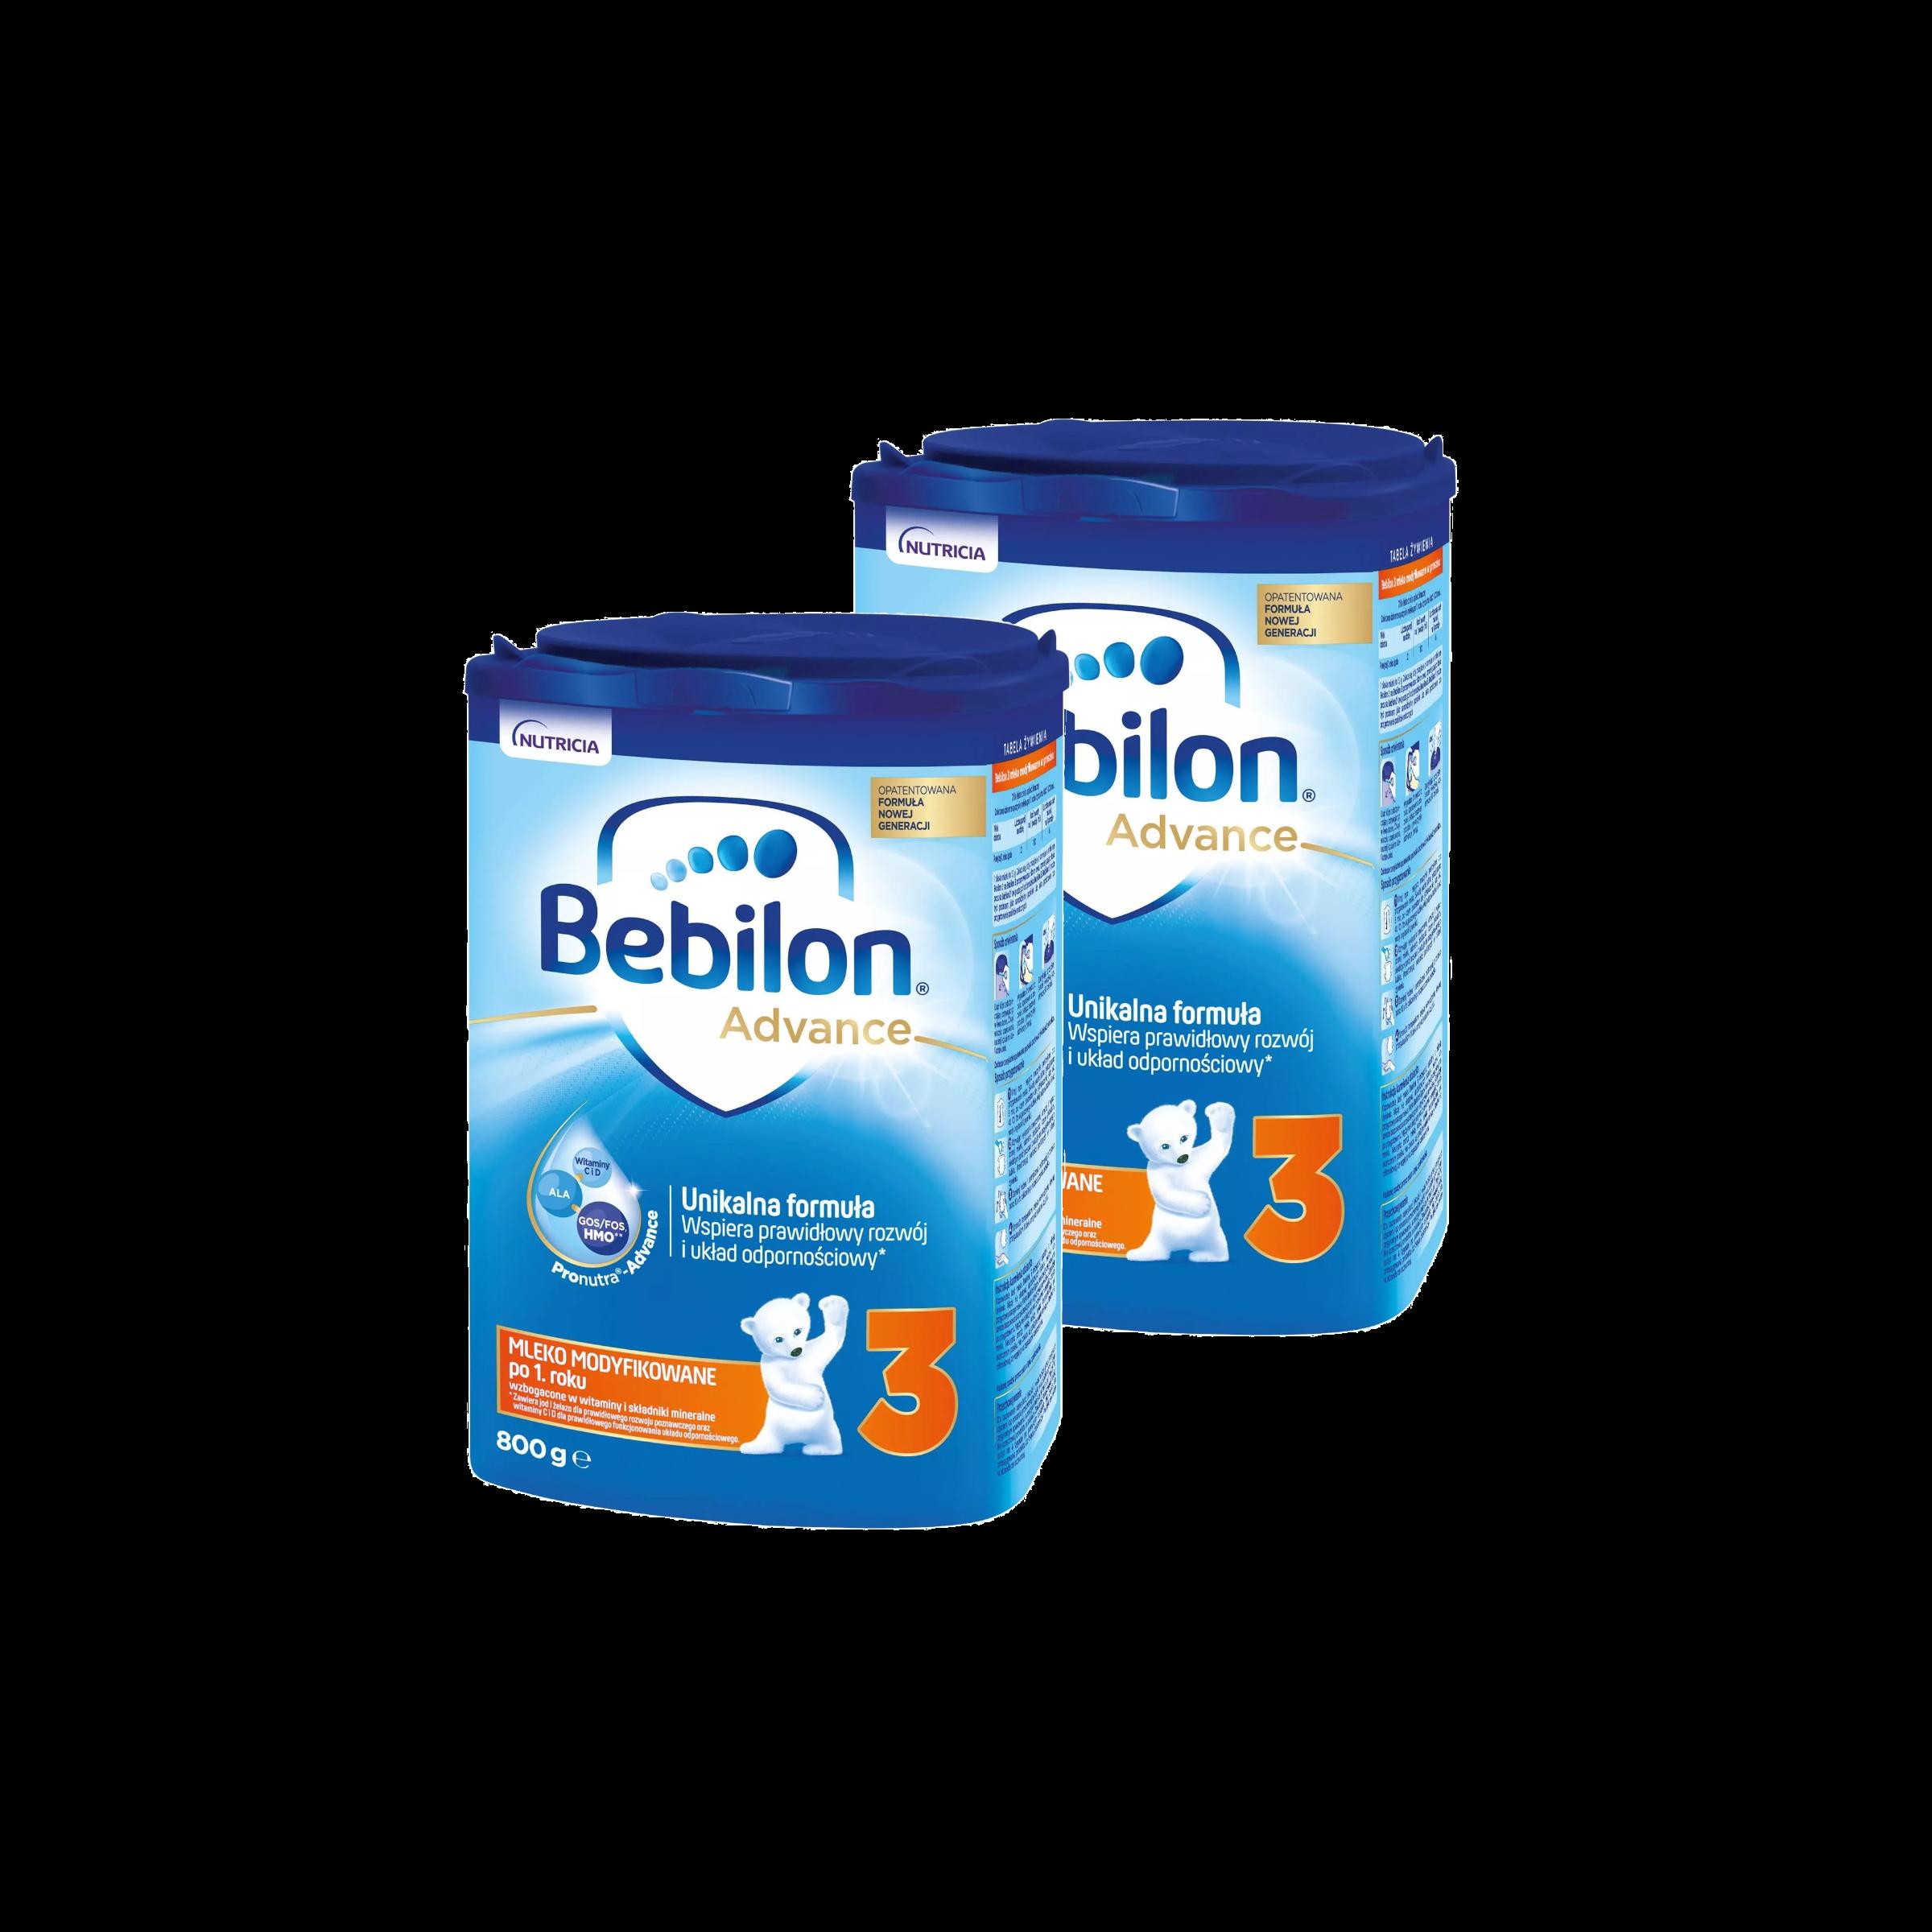 bebilon3_800_2pak